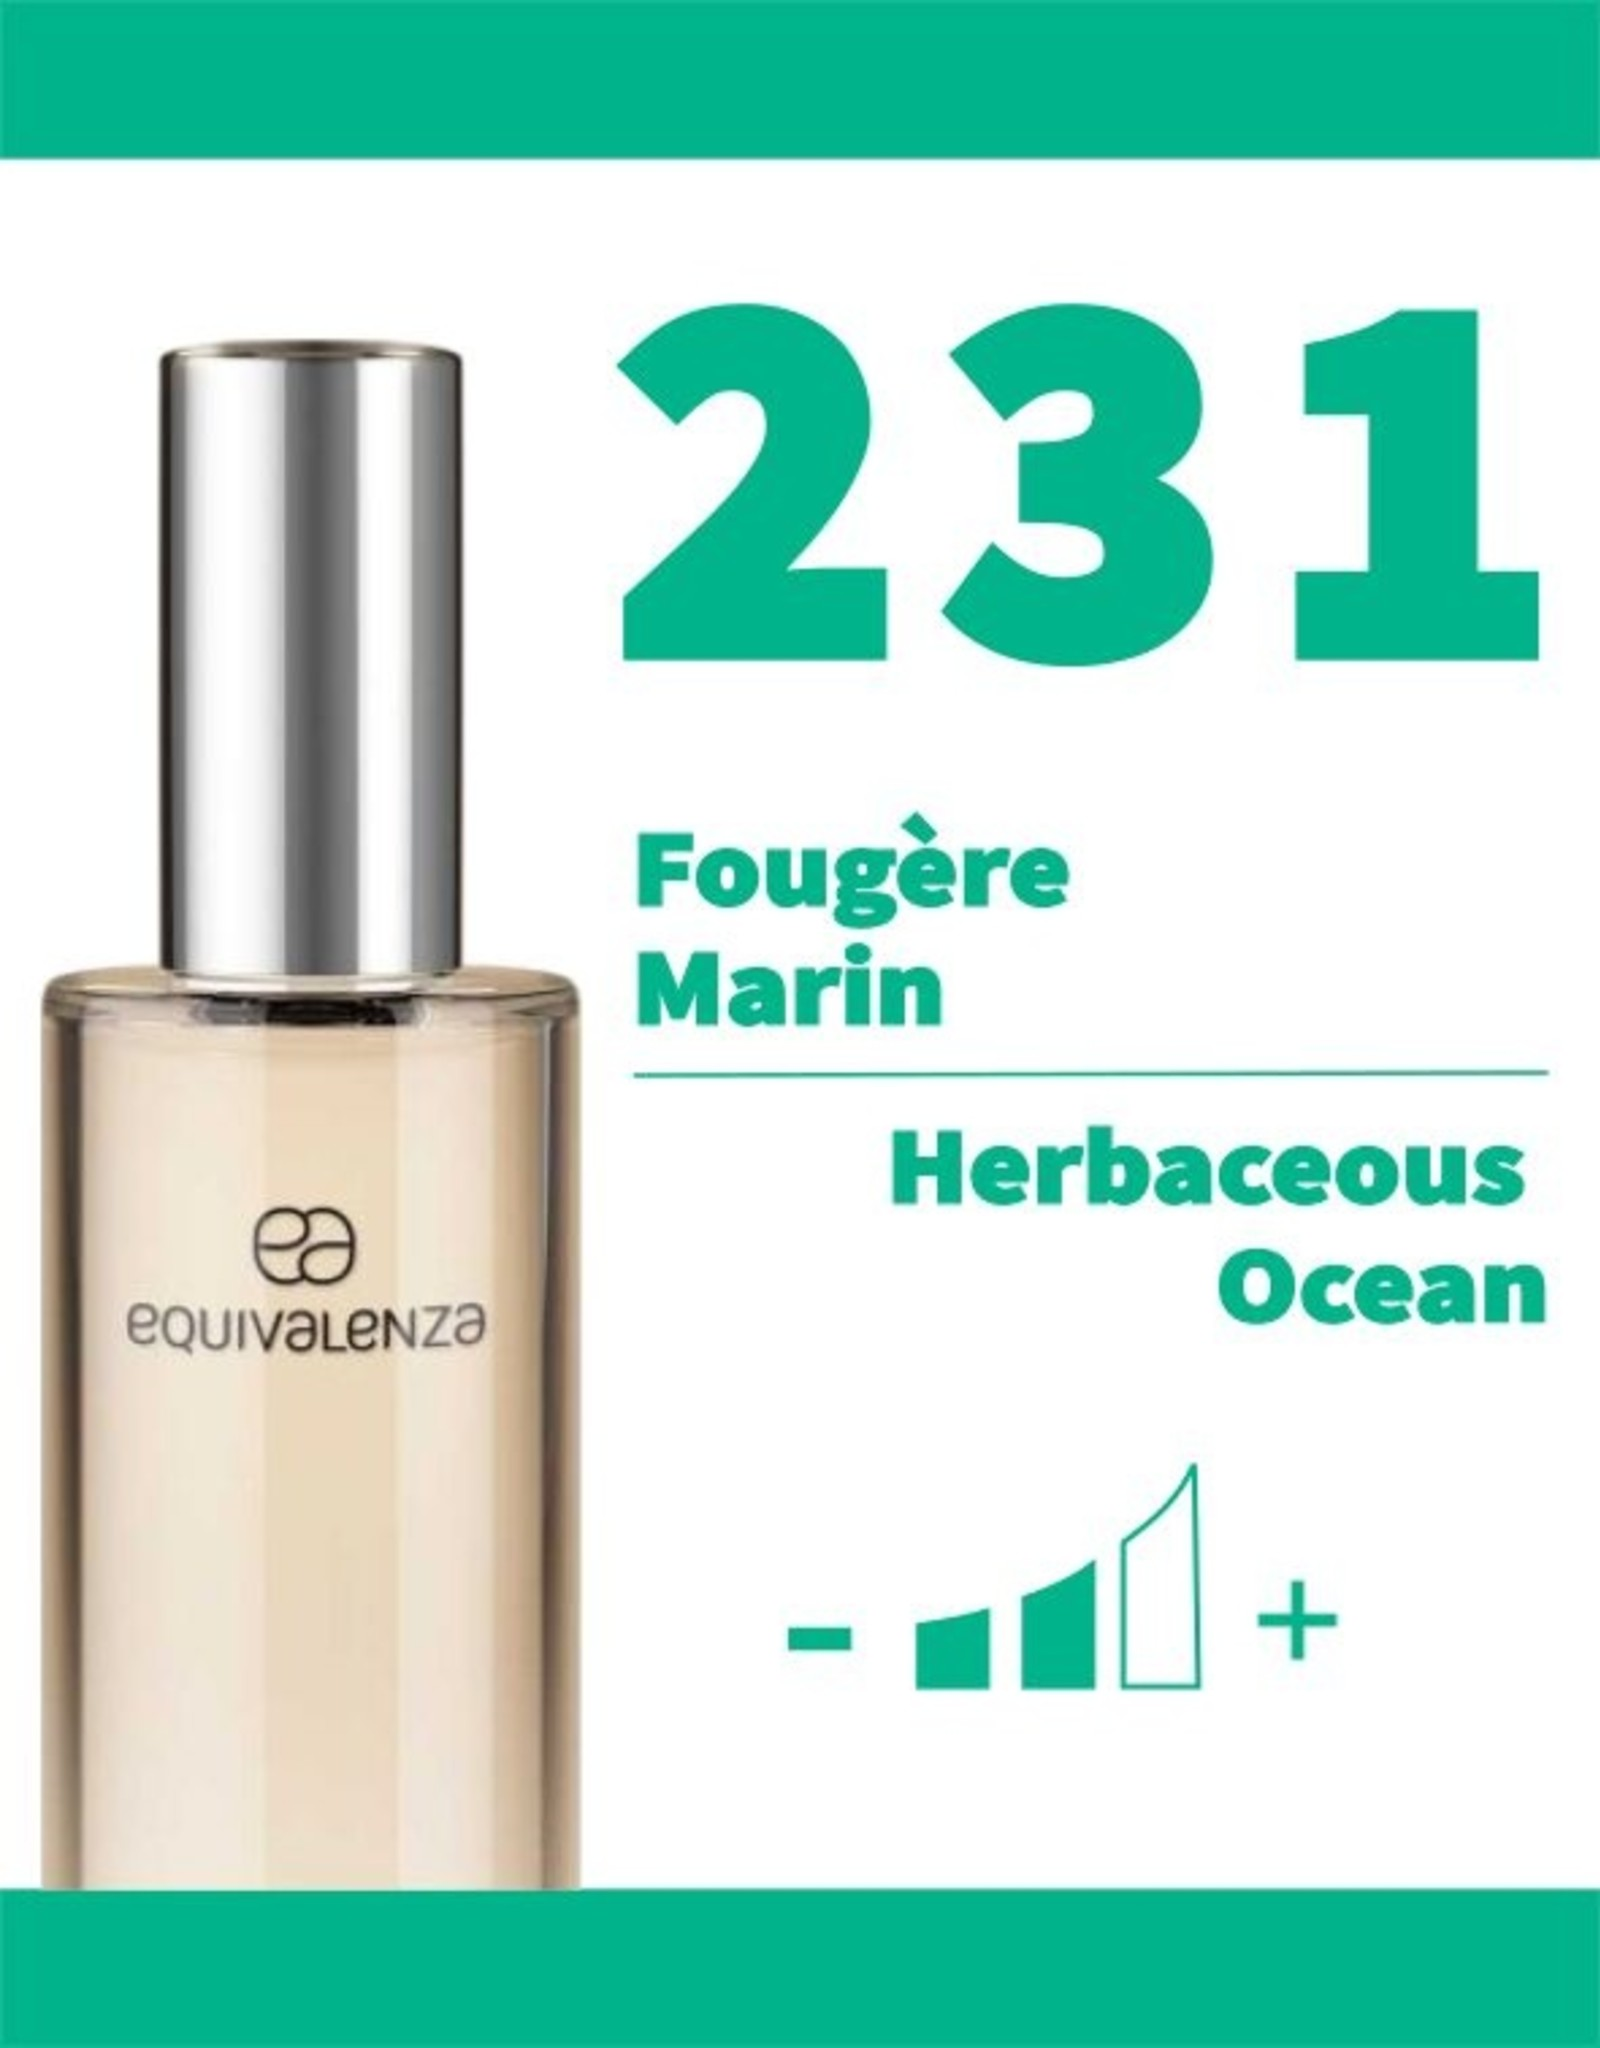 Equivalenza Fougère Marin 231